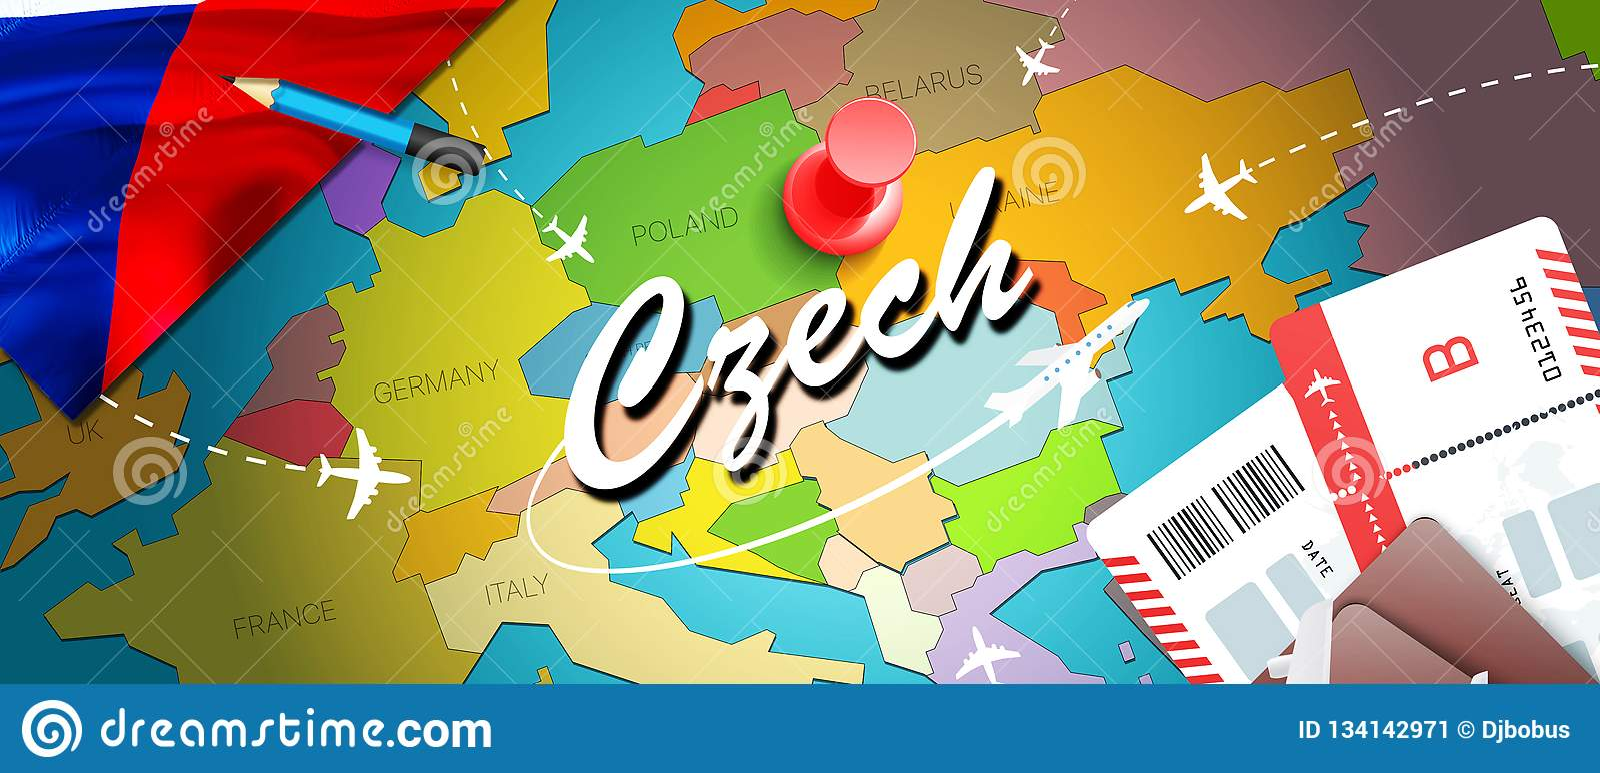 Czech travel concept map background with planes, tickets. Visit Czech travel and tourism destination concept. Czech flag on map.